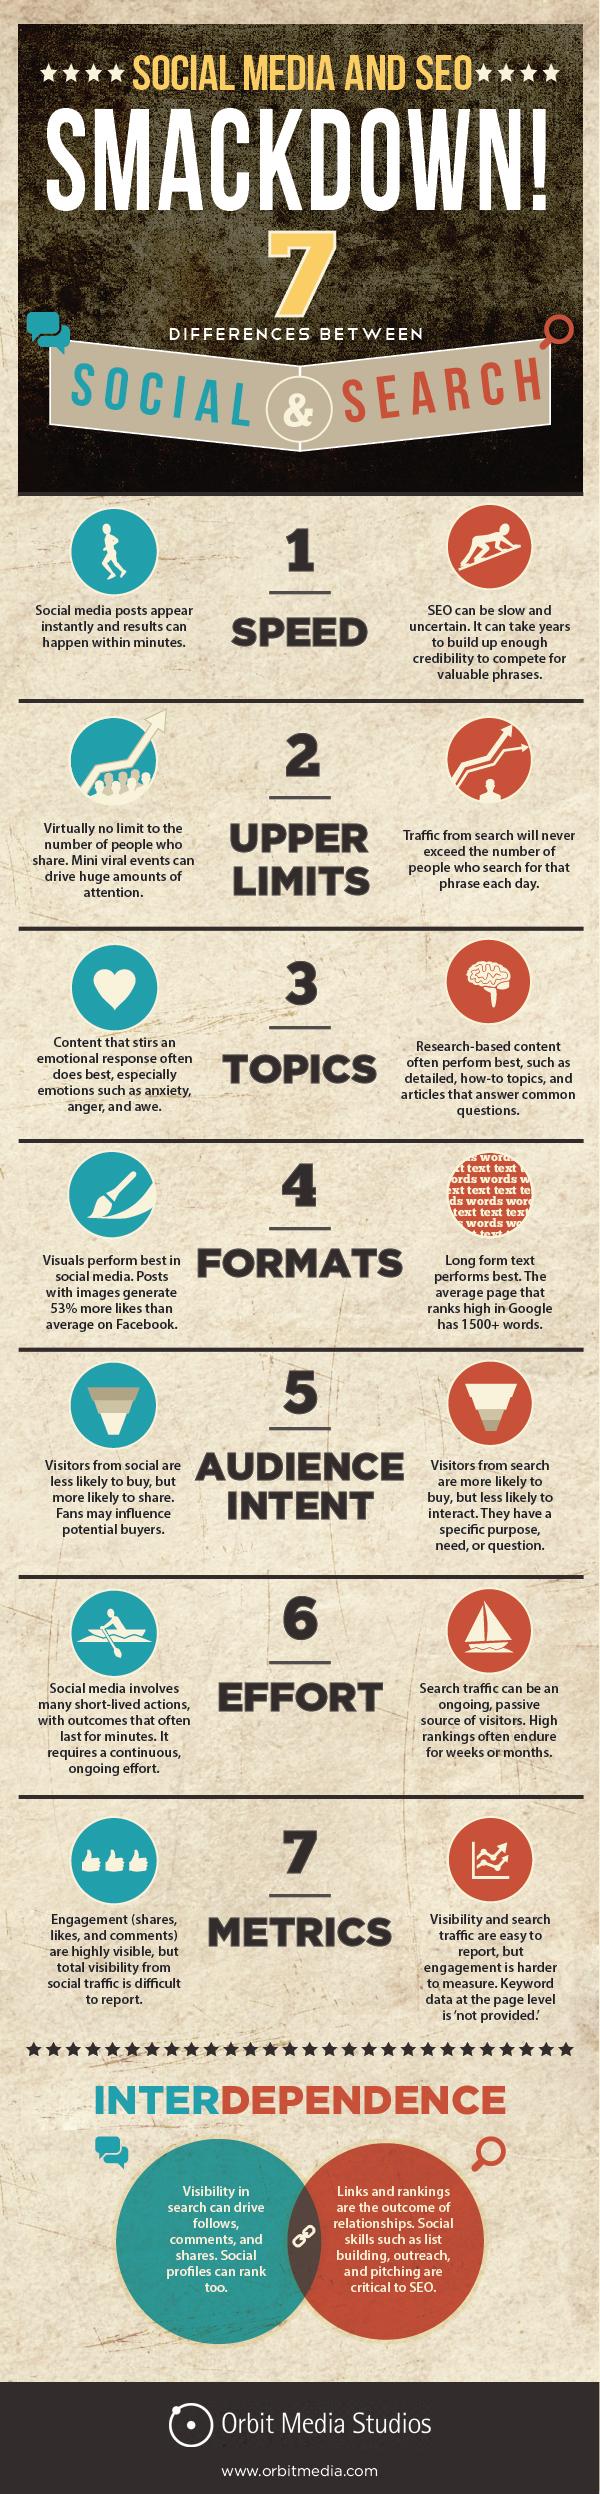 social_media_SEO_infographic